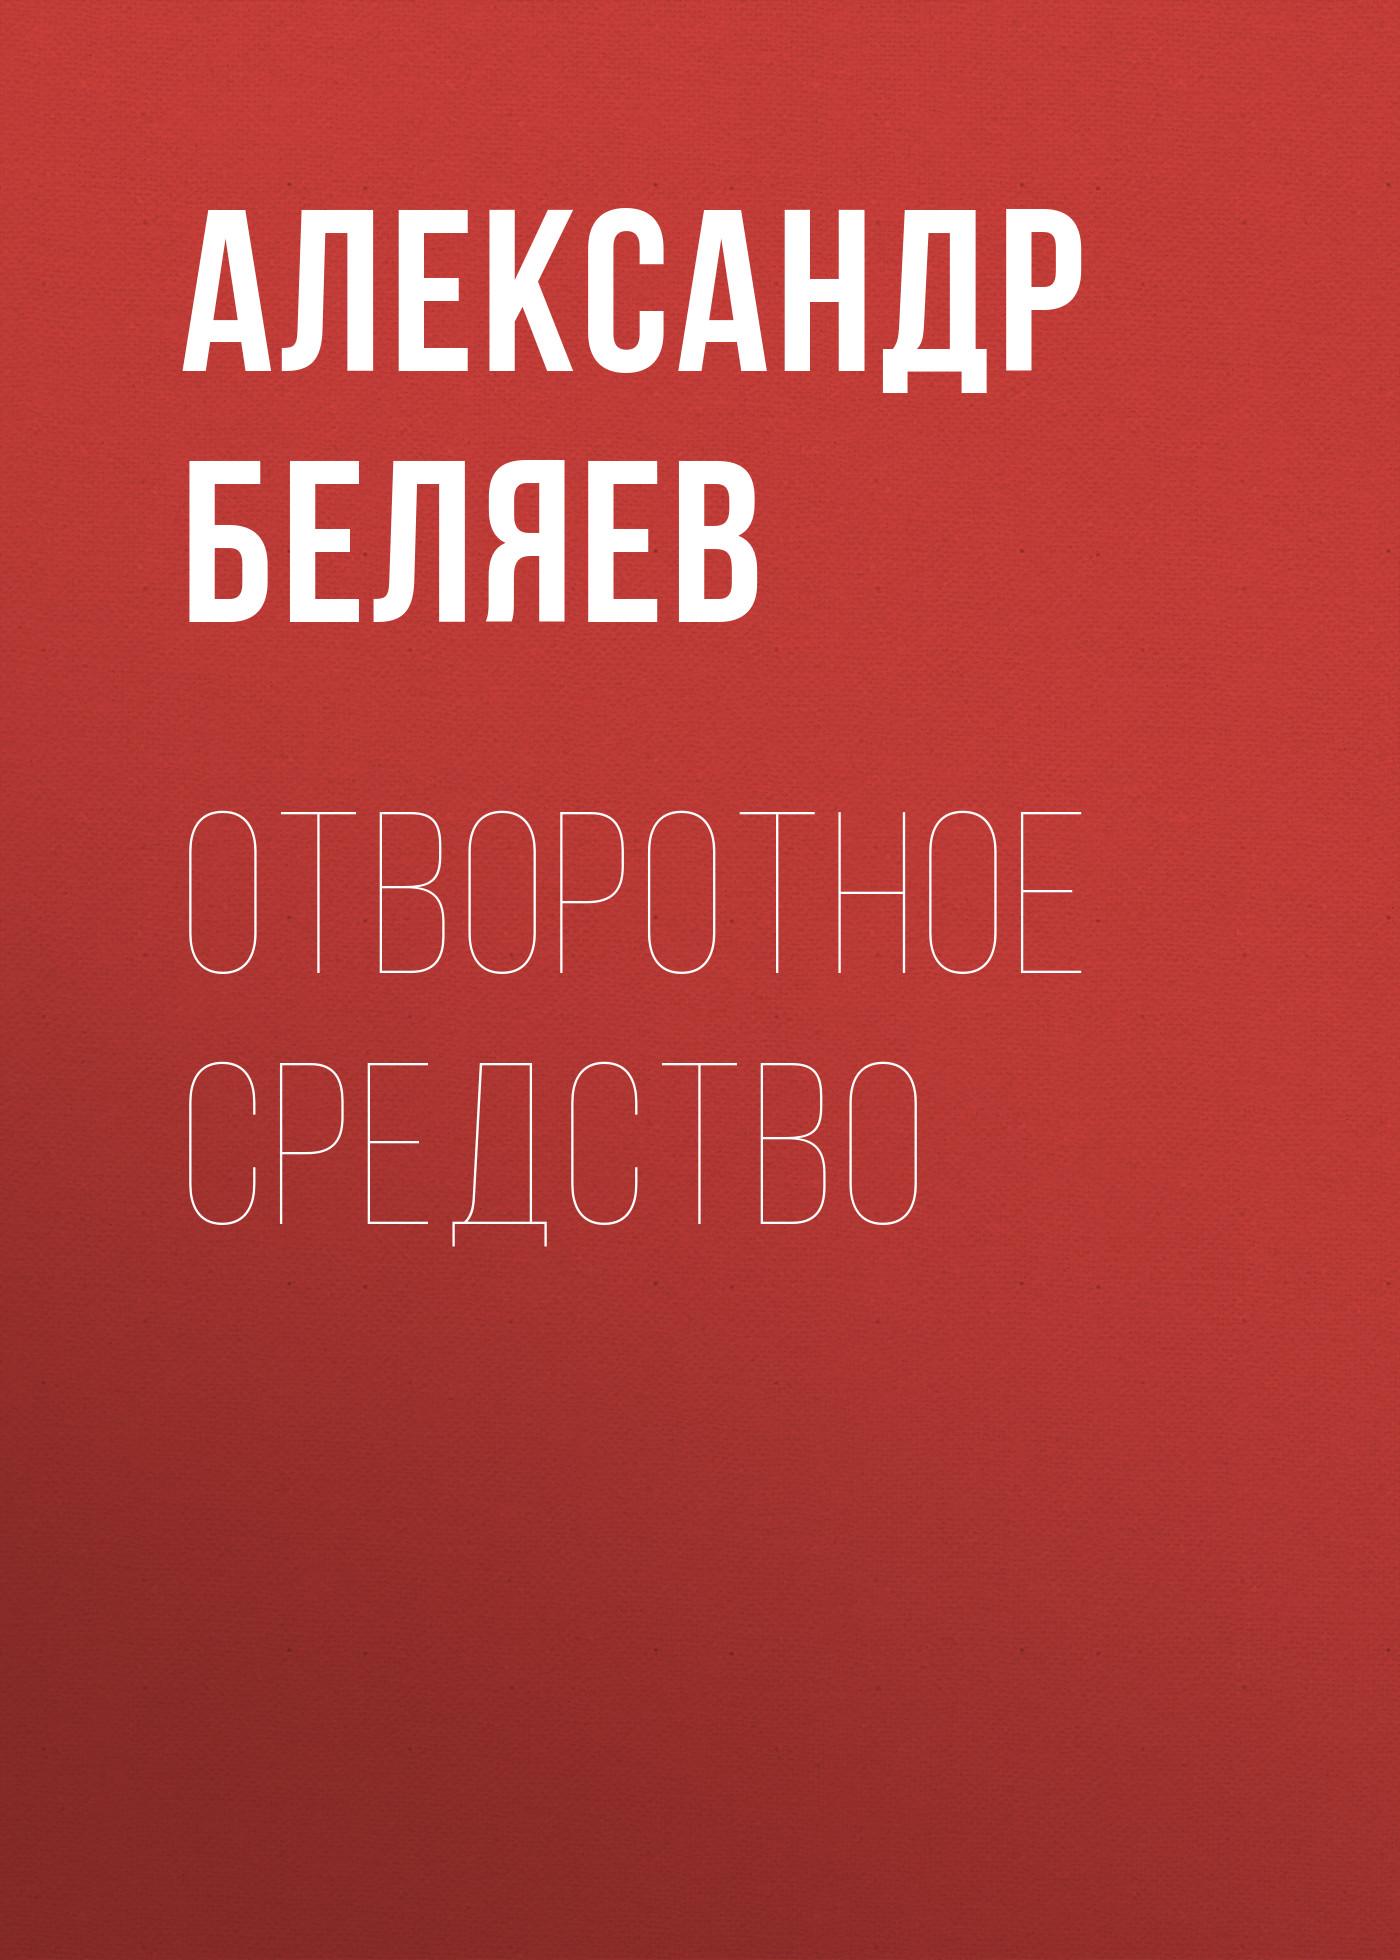 Александр Беляев Отворотное средство александр беляев чёртова мельница